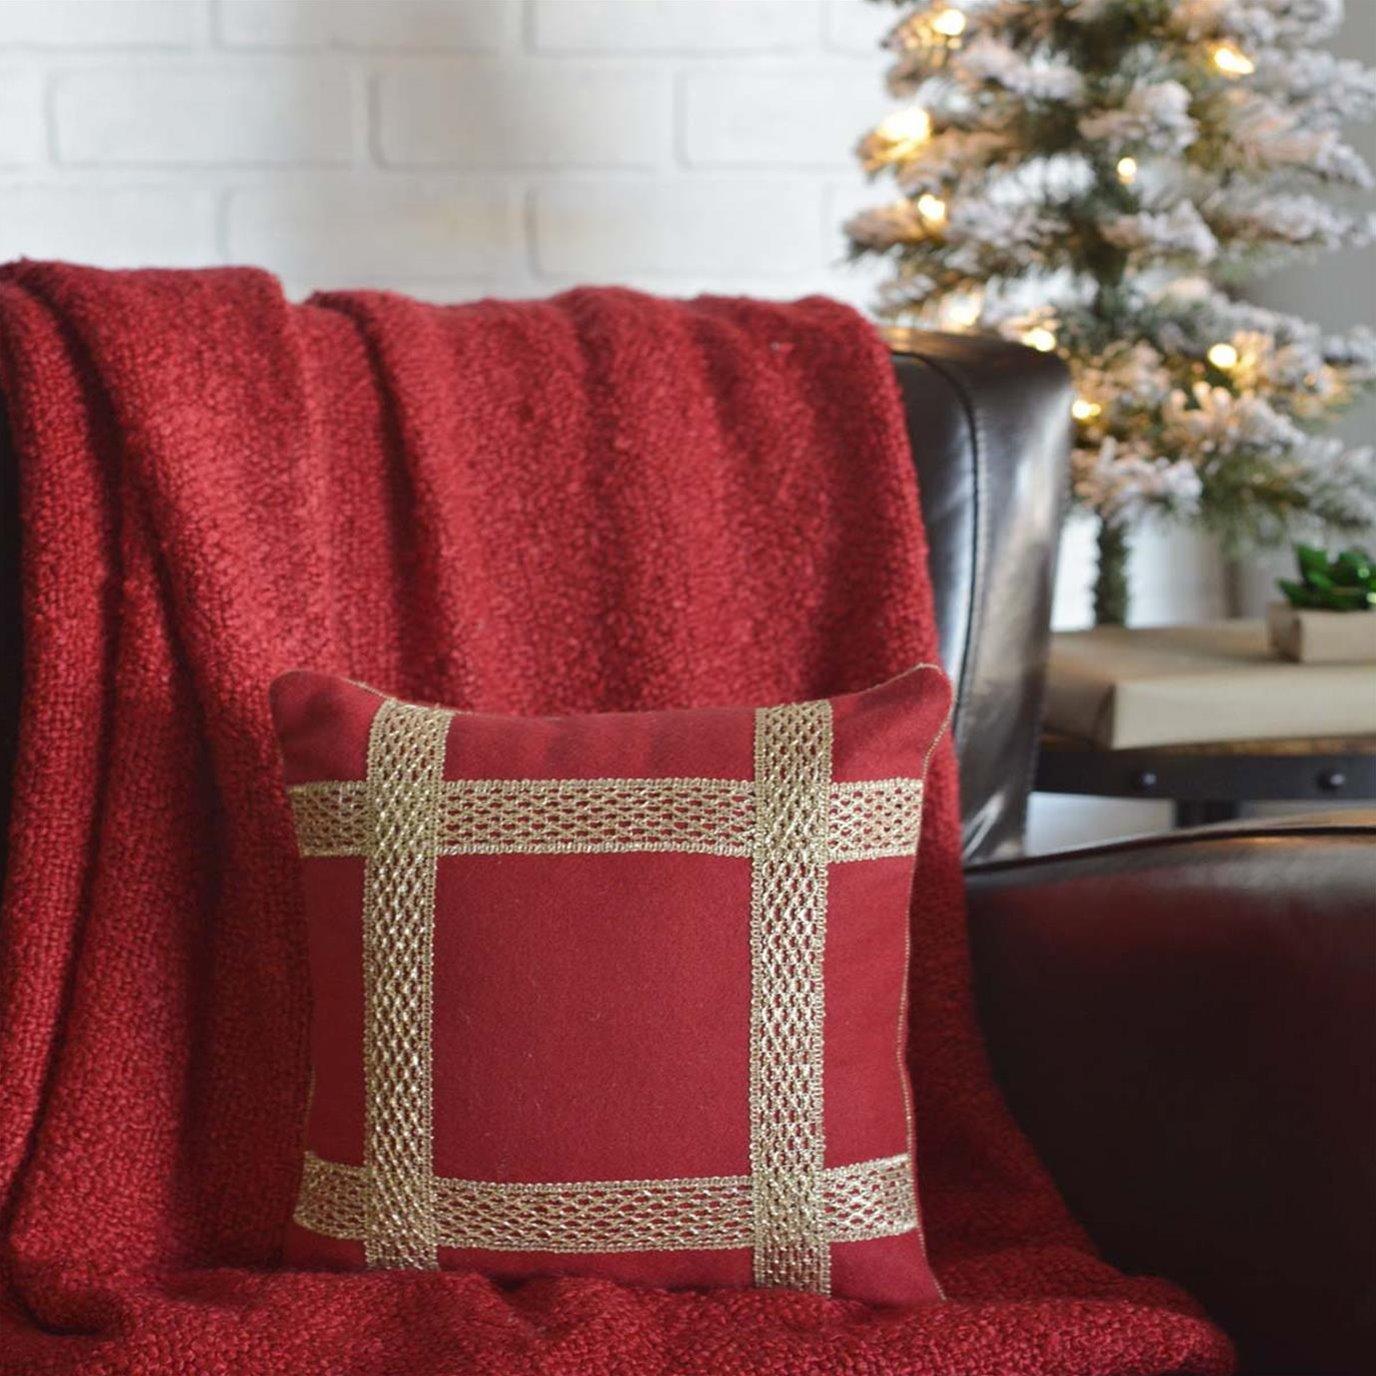 Revelry Trim Pillow 12x12